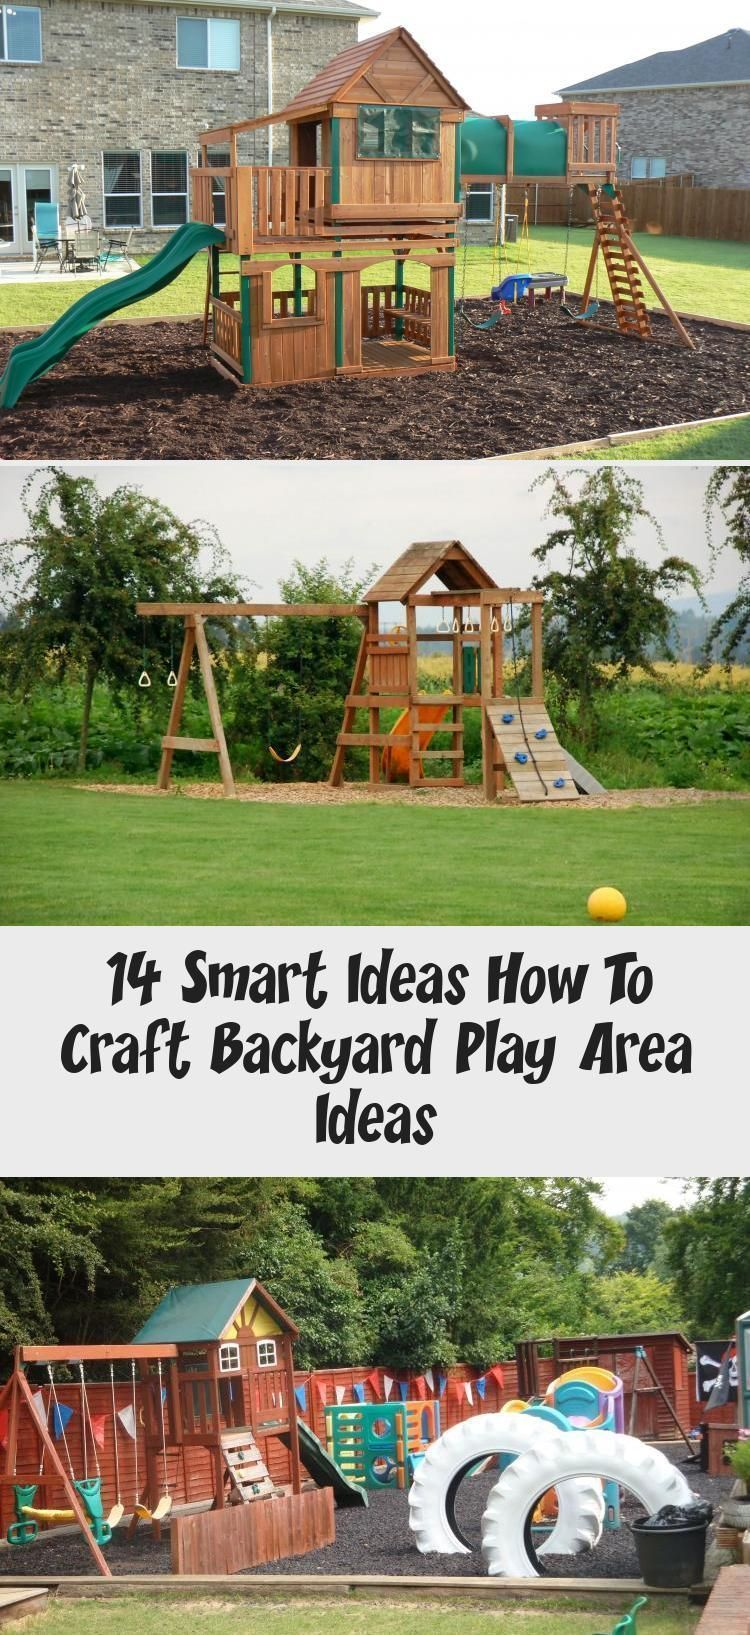 14 Smart Ideas How to Craft Backyard Play Area Ideas #Homedecorlove #kidsbackyar...#area #backyard #craft #homedecorlove #ideas #kidsbackyar #play #smart #Backyard kids play area ideas